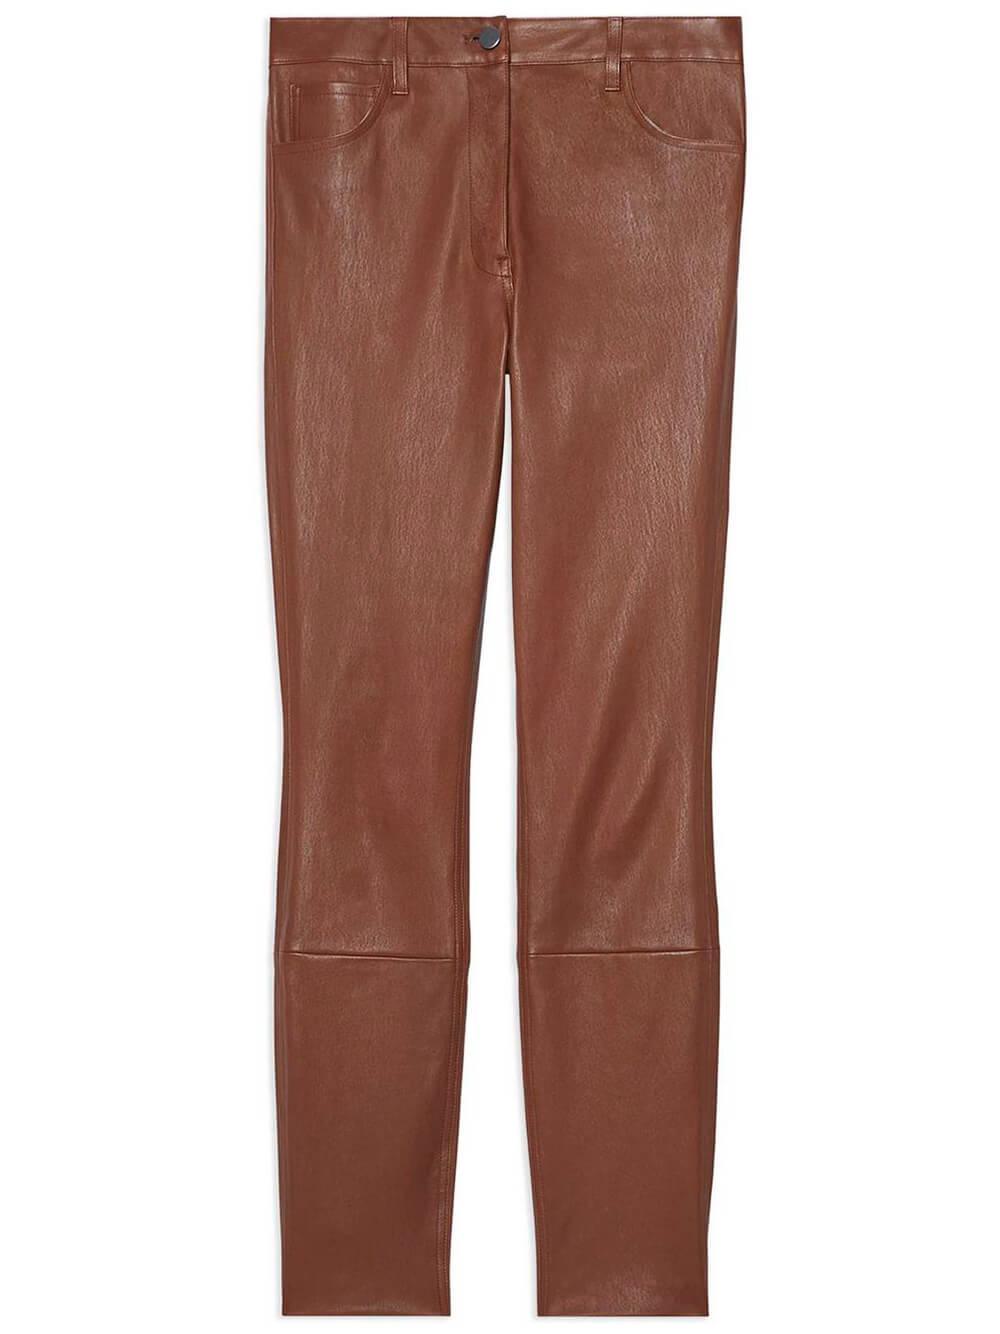 Bristol Leather Jean Item # K0700202